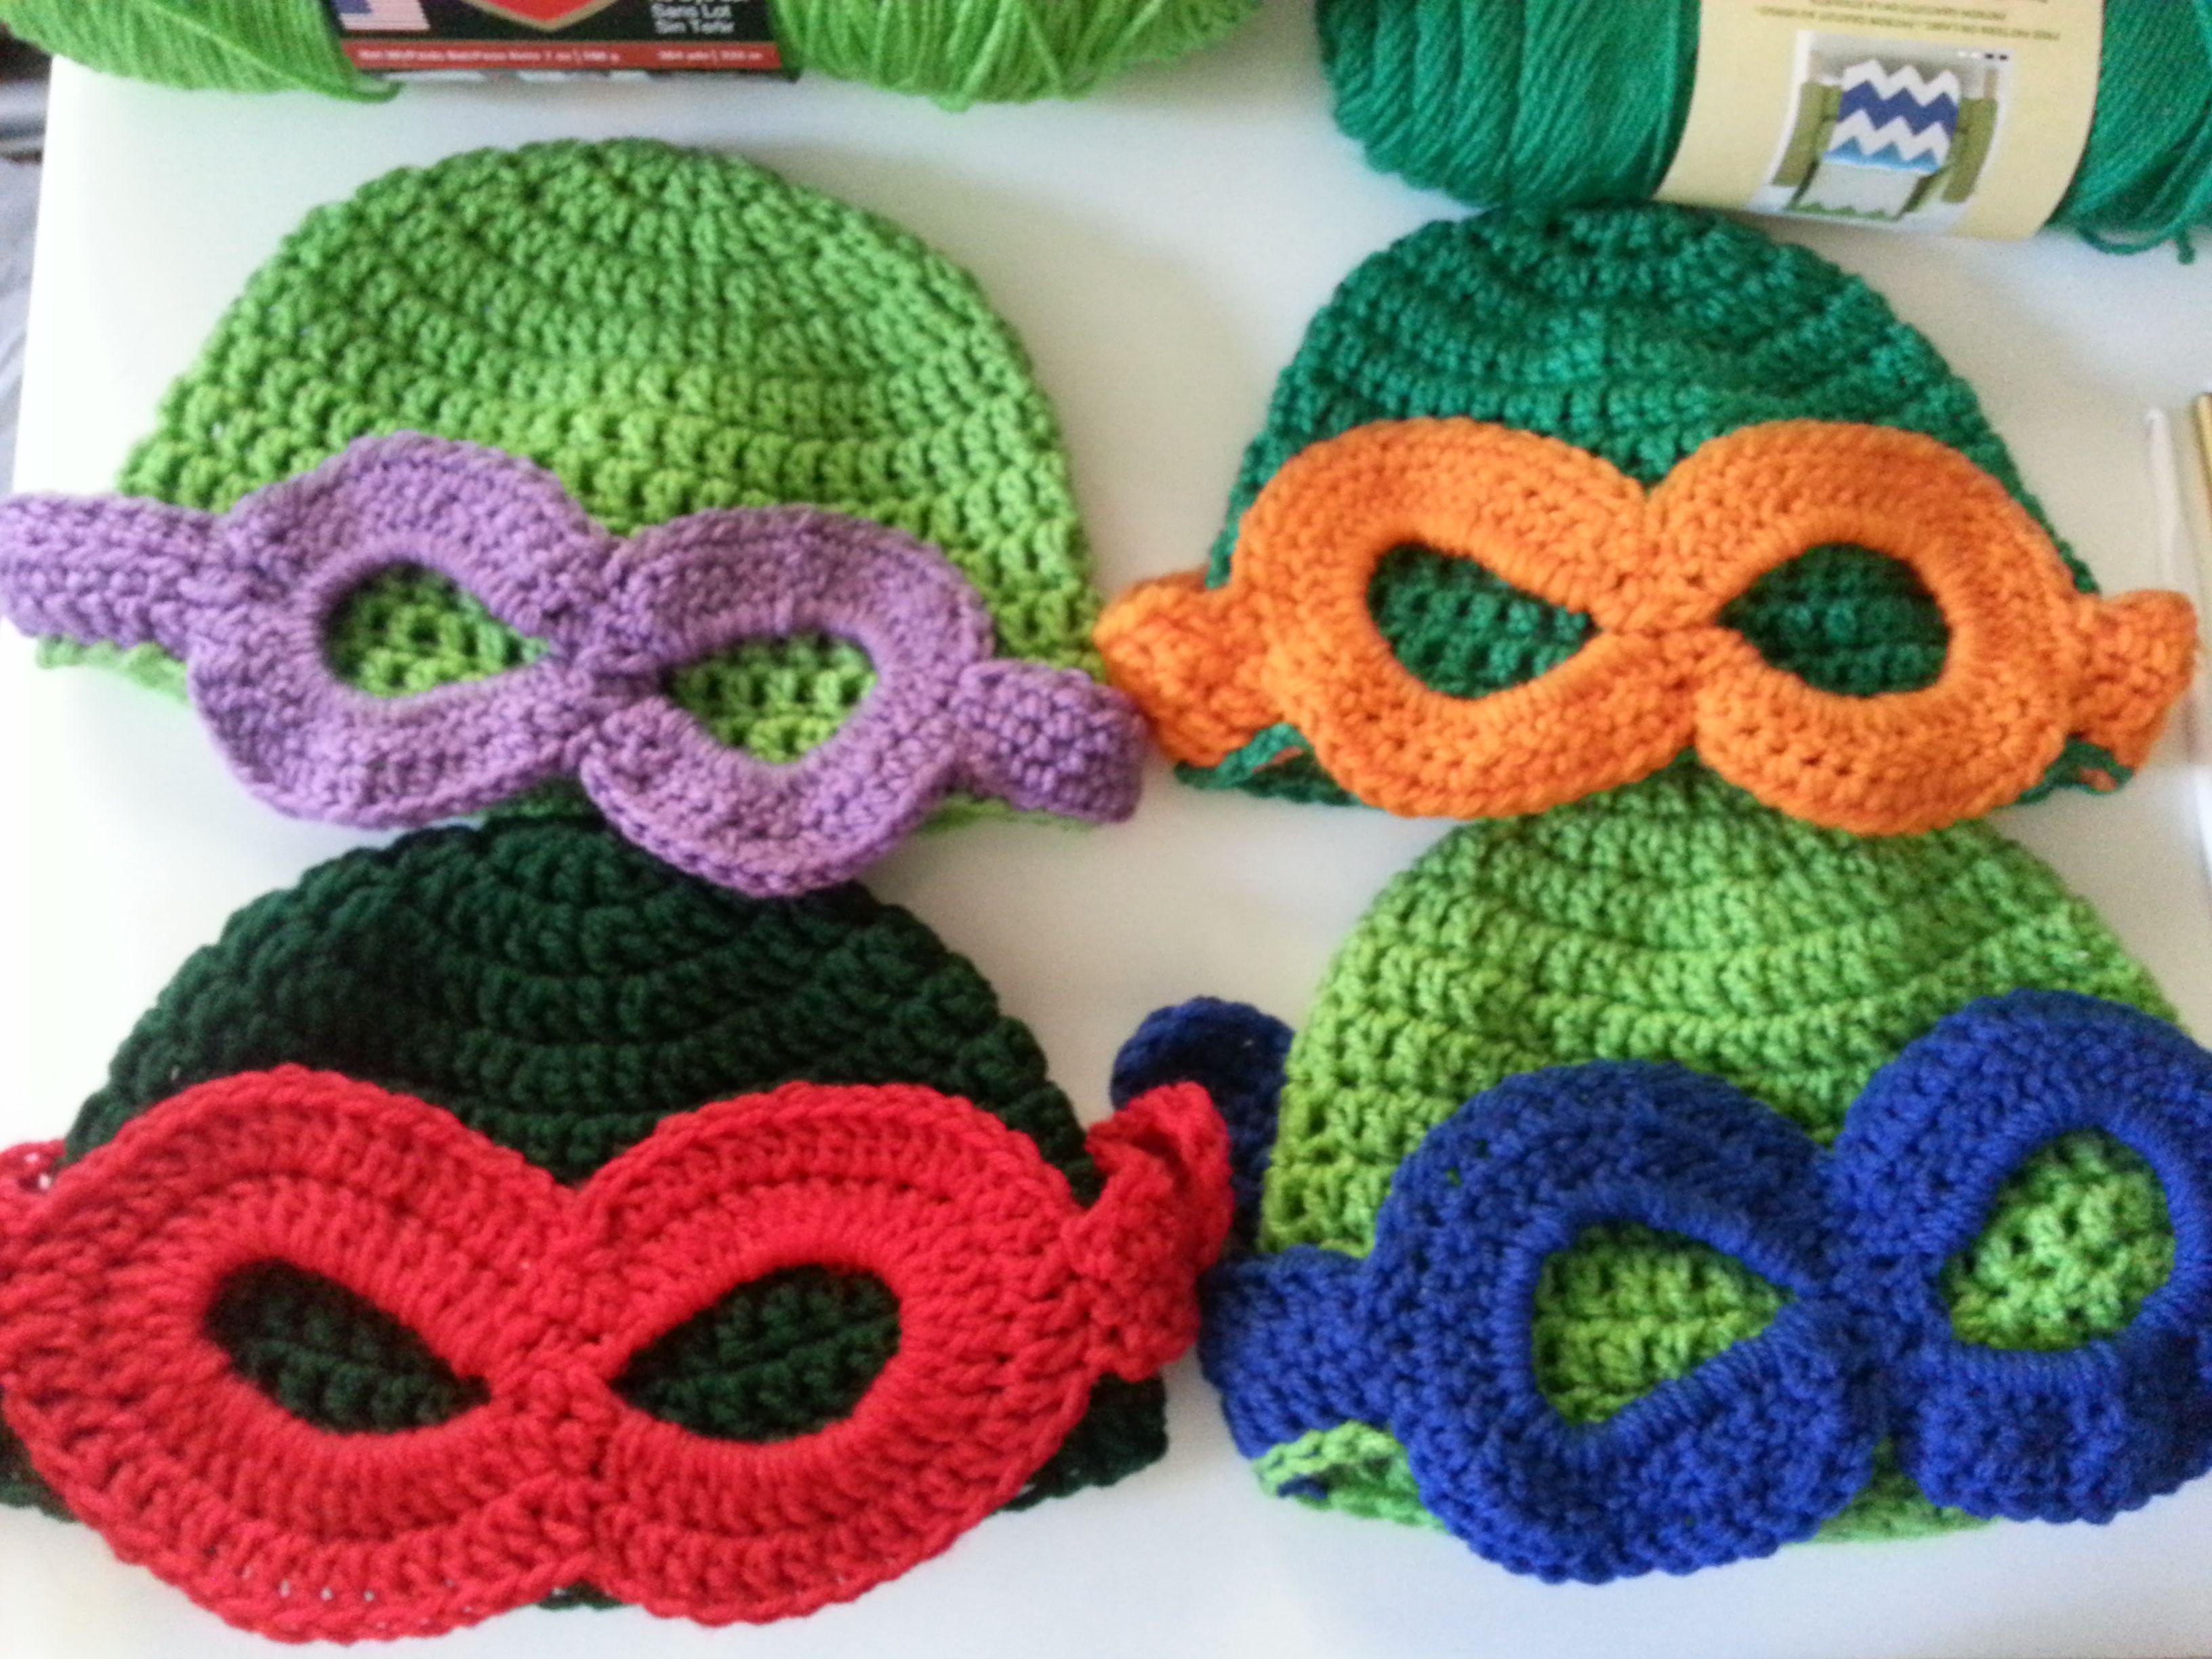 Teenage Mutant Ninja Turtle Beanie   Gorros crochet, Gorros y Ropita ...